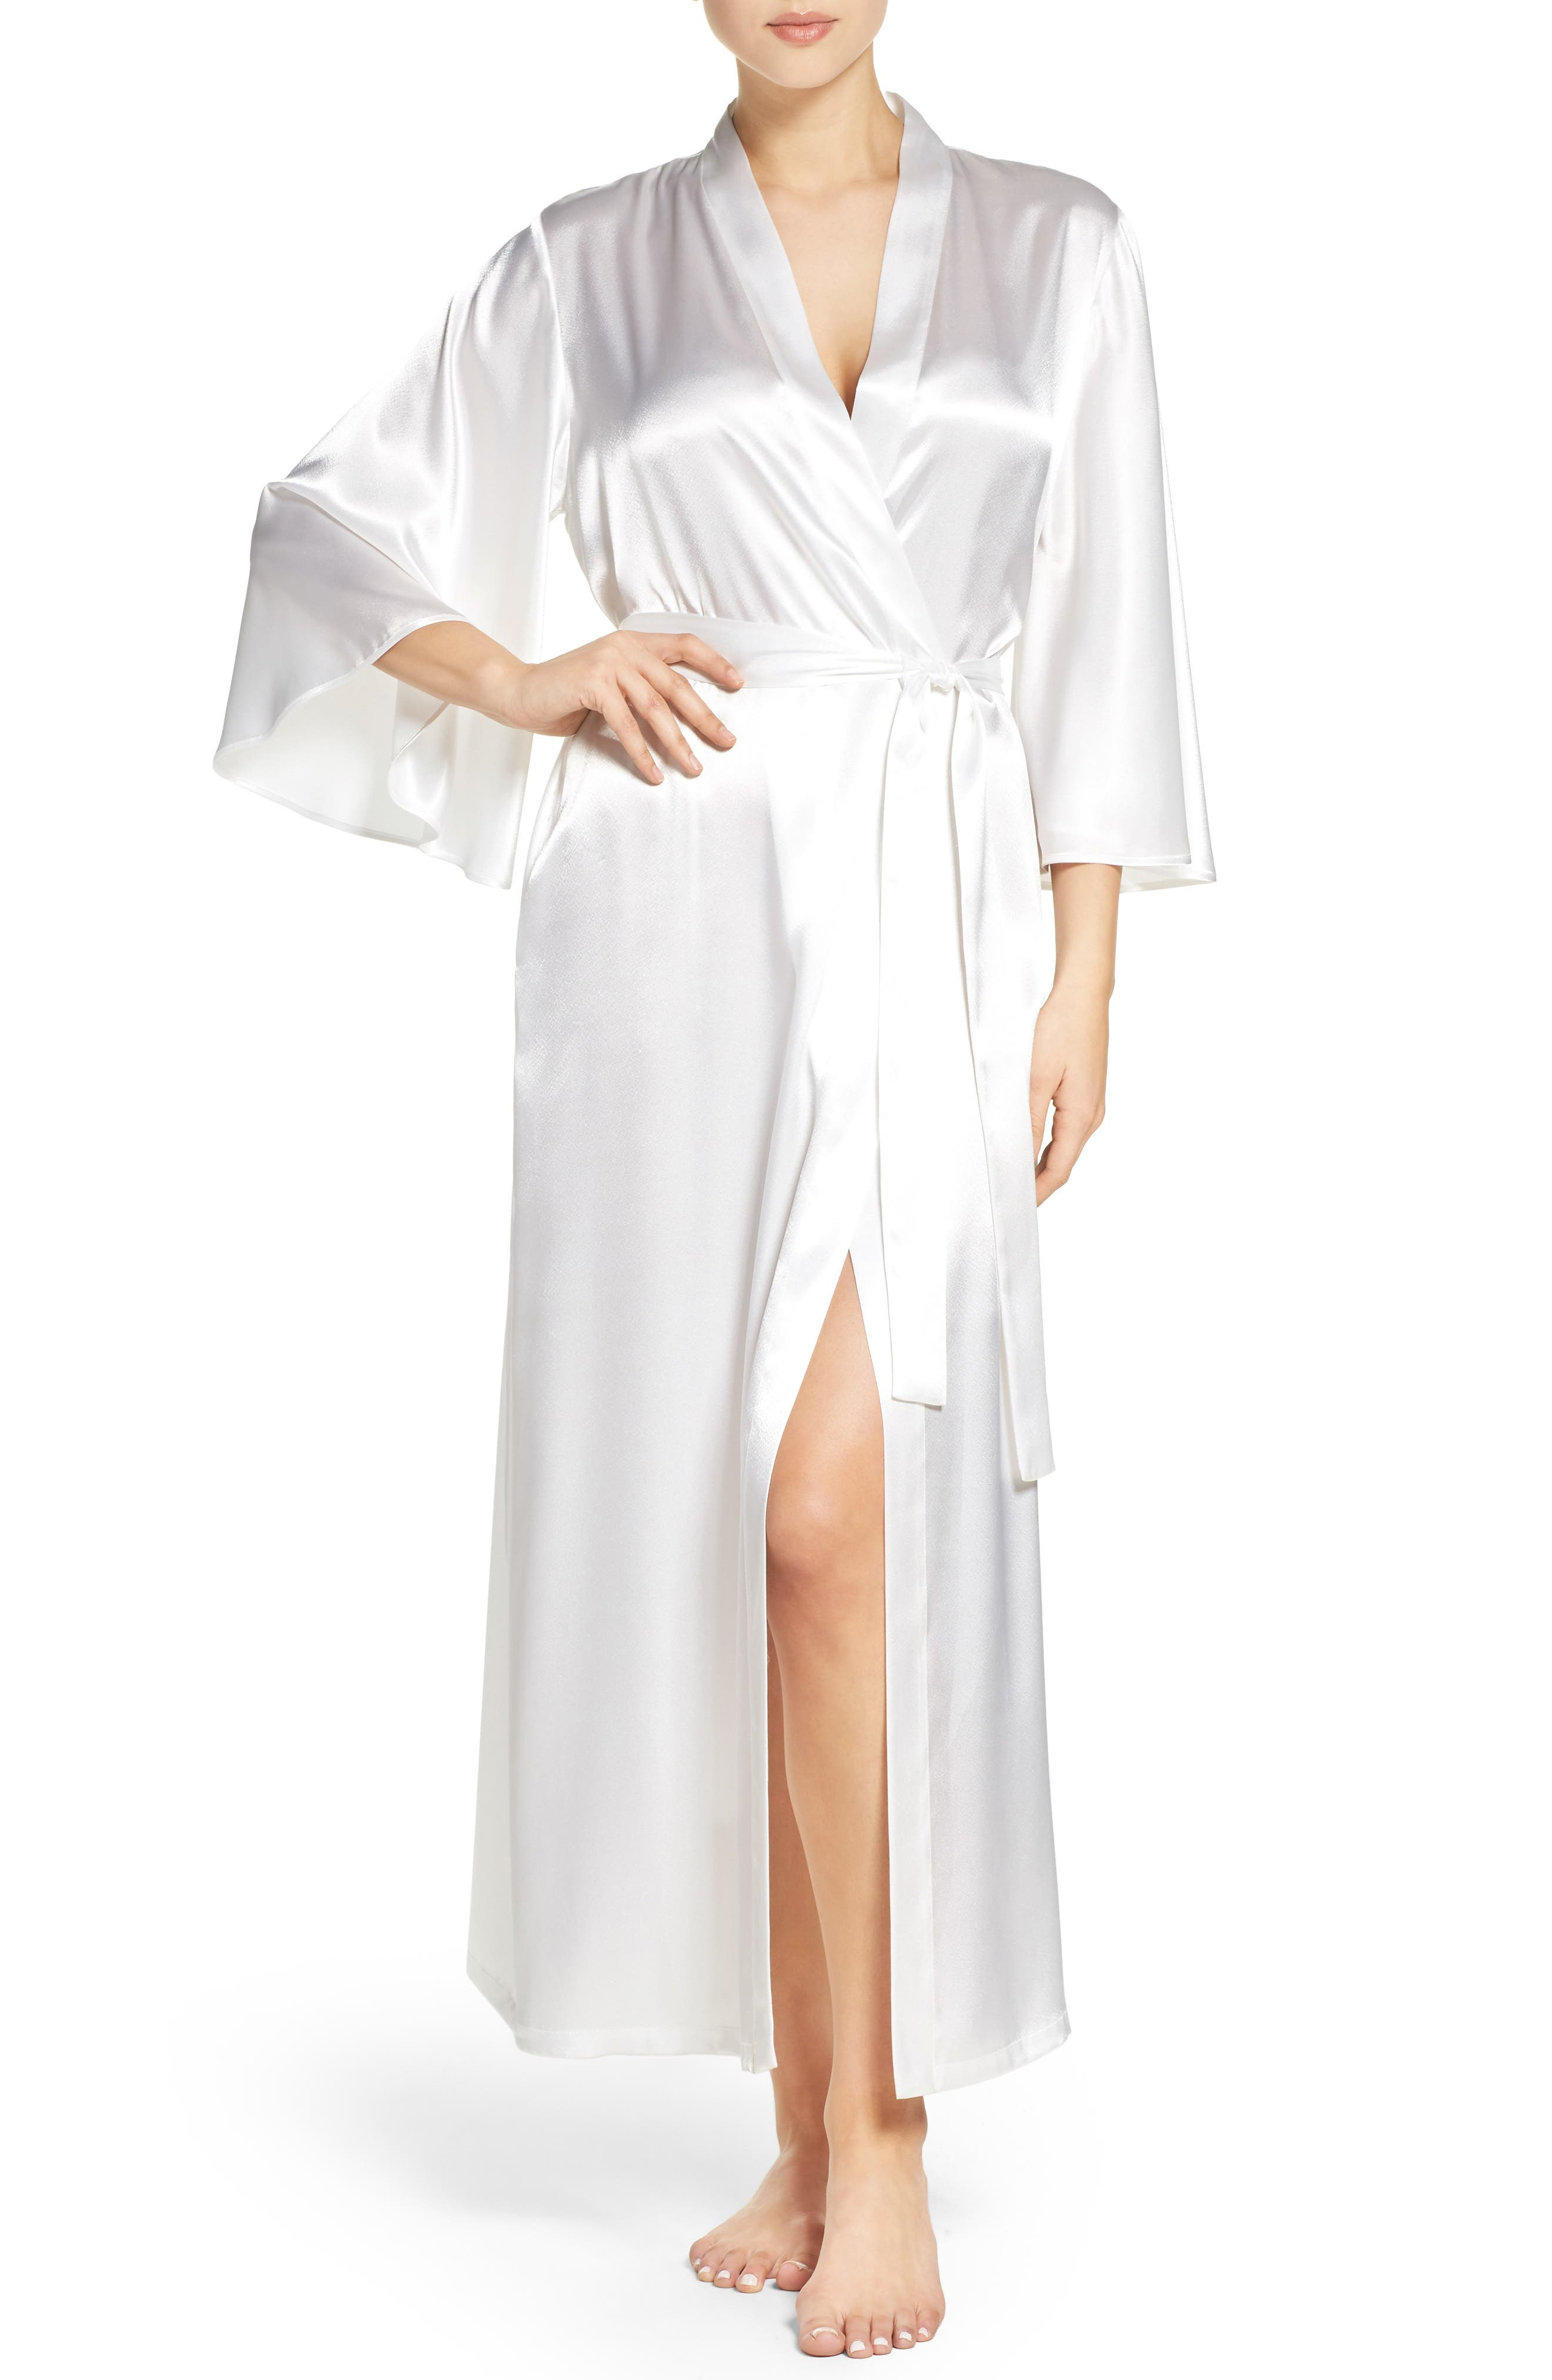 Oscar de la Renta Sleepwear Charmeuse Robe